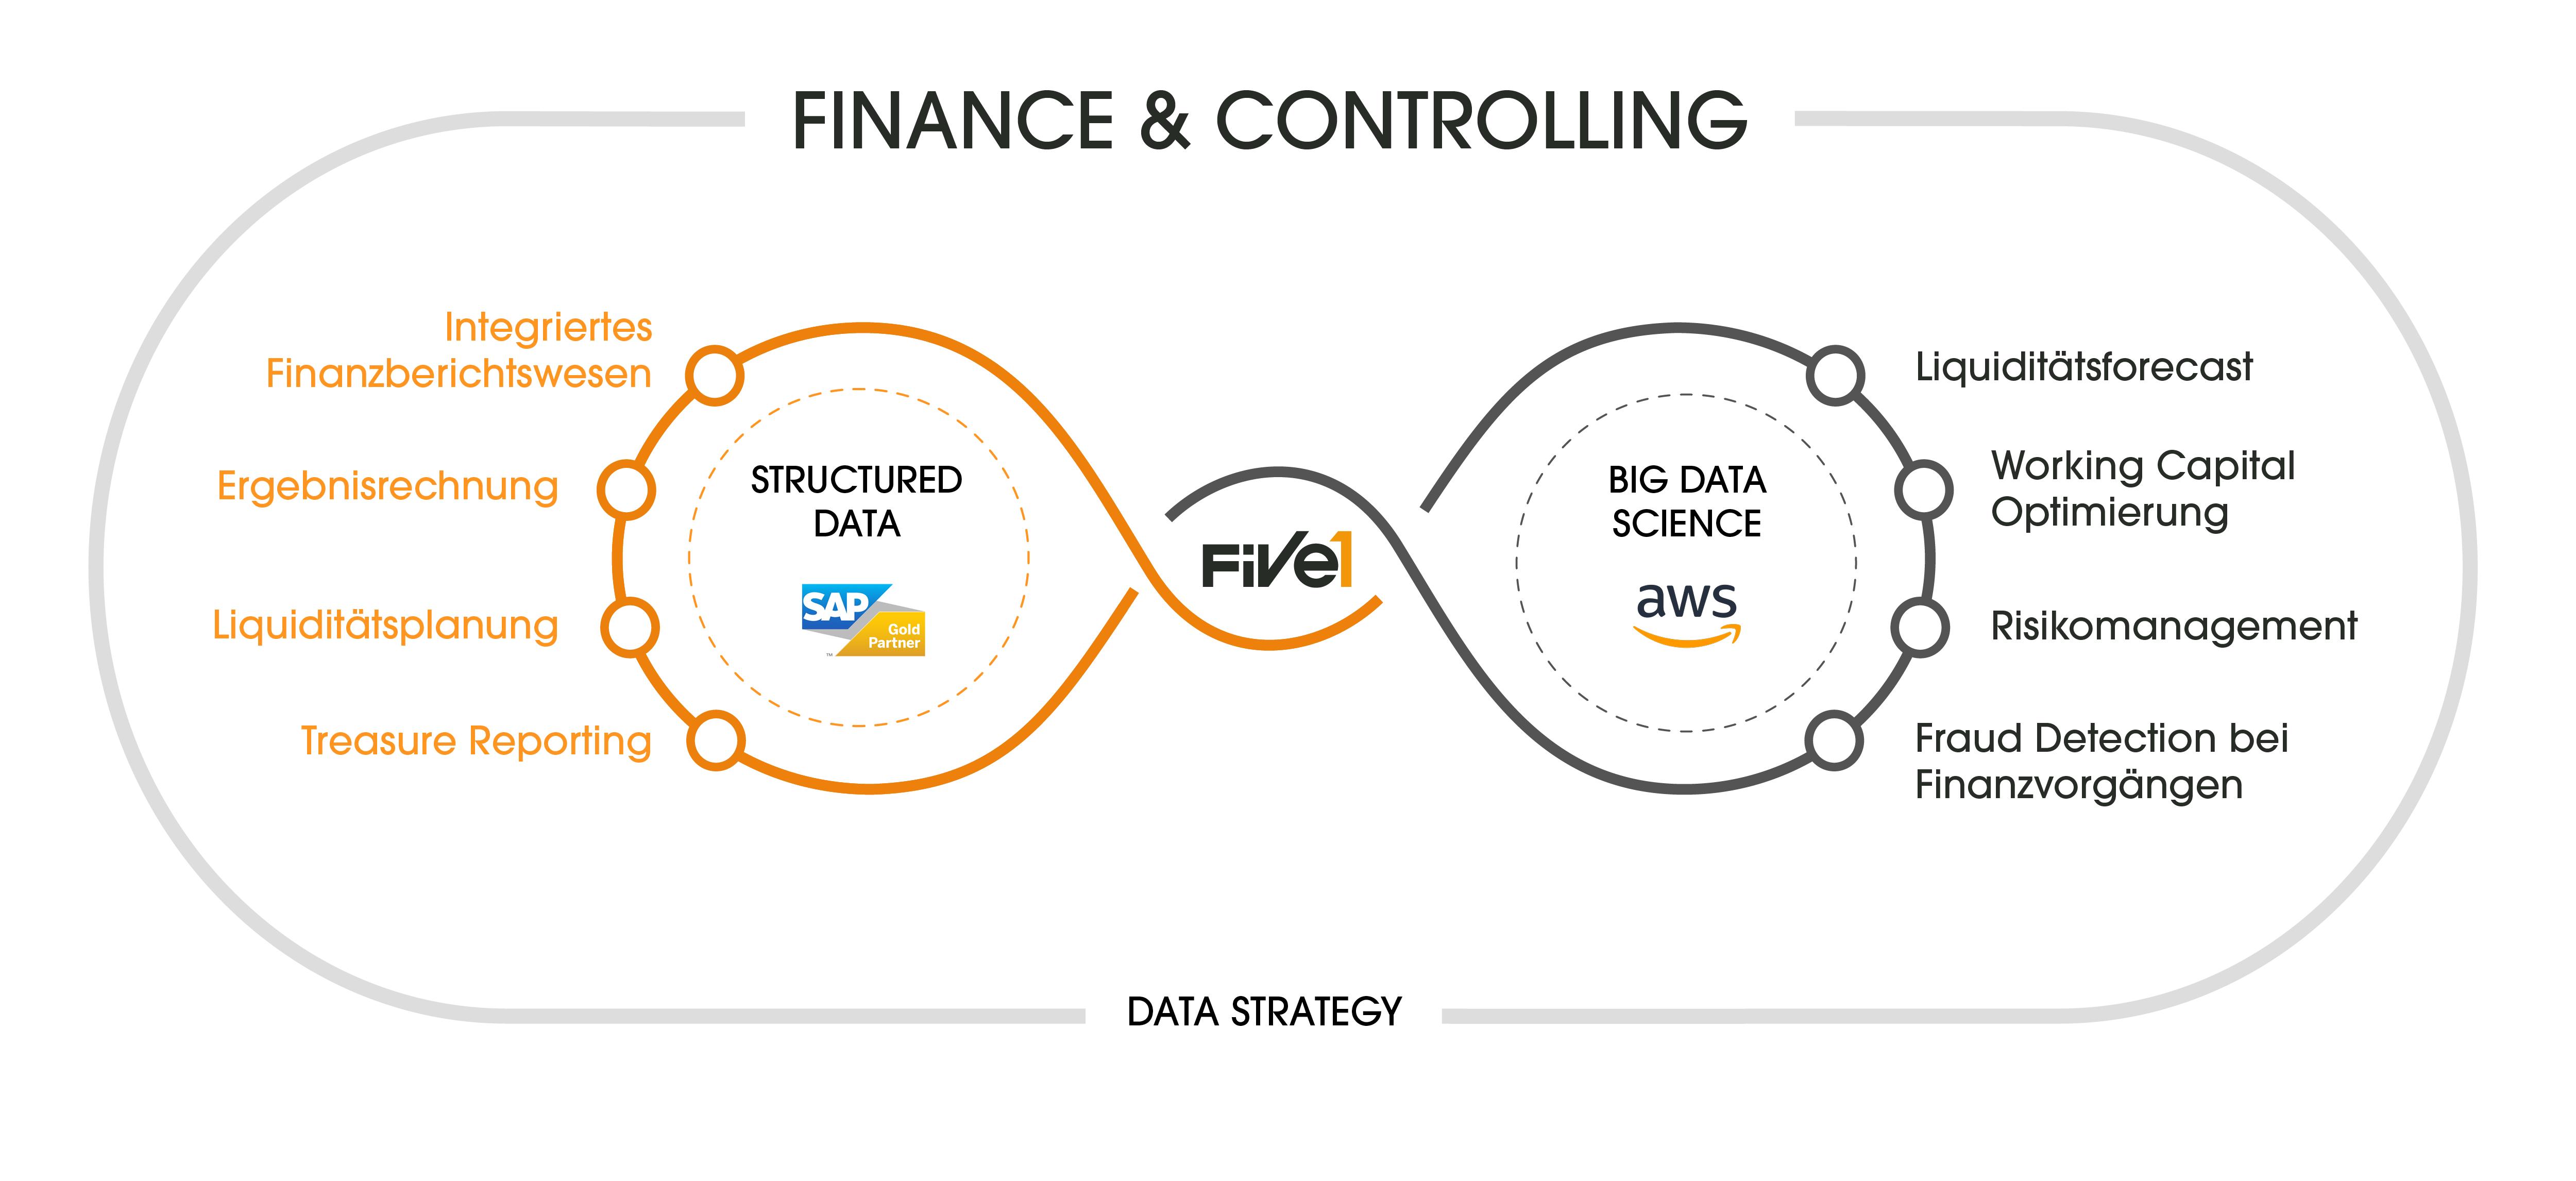 Kreise Finance & Controlling